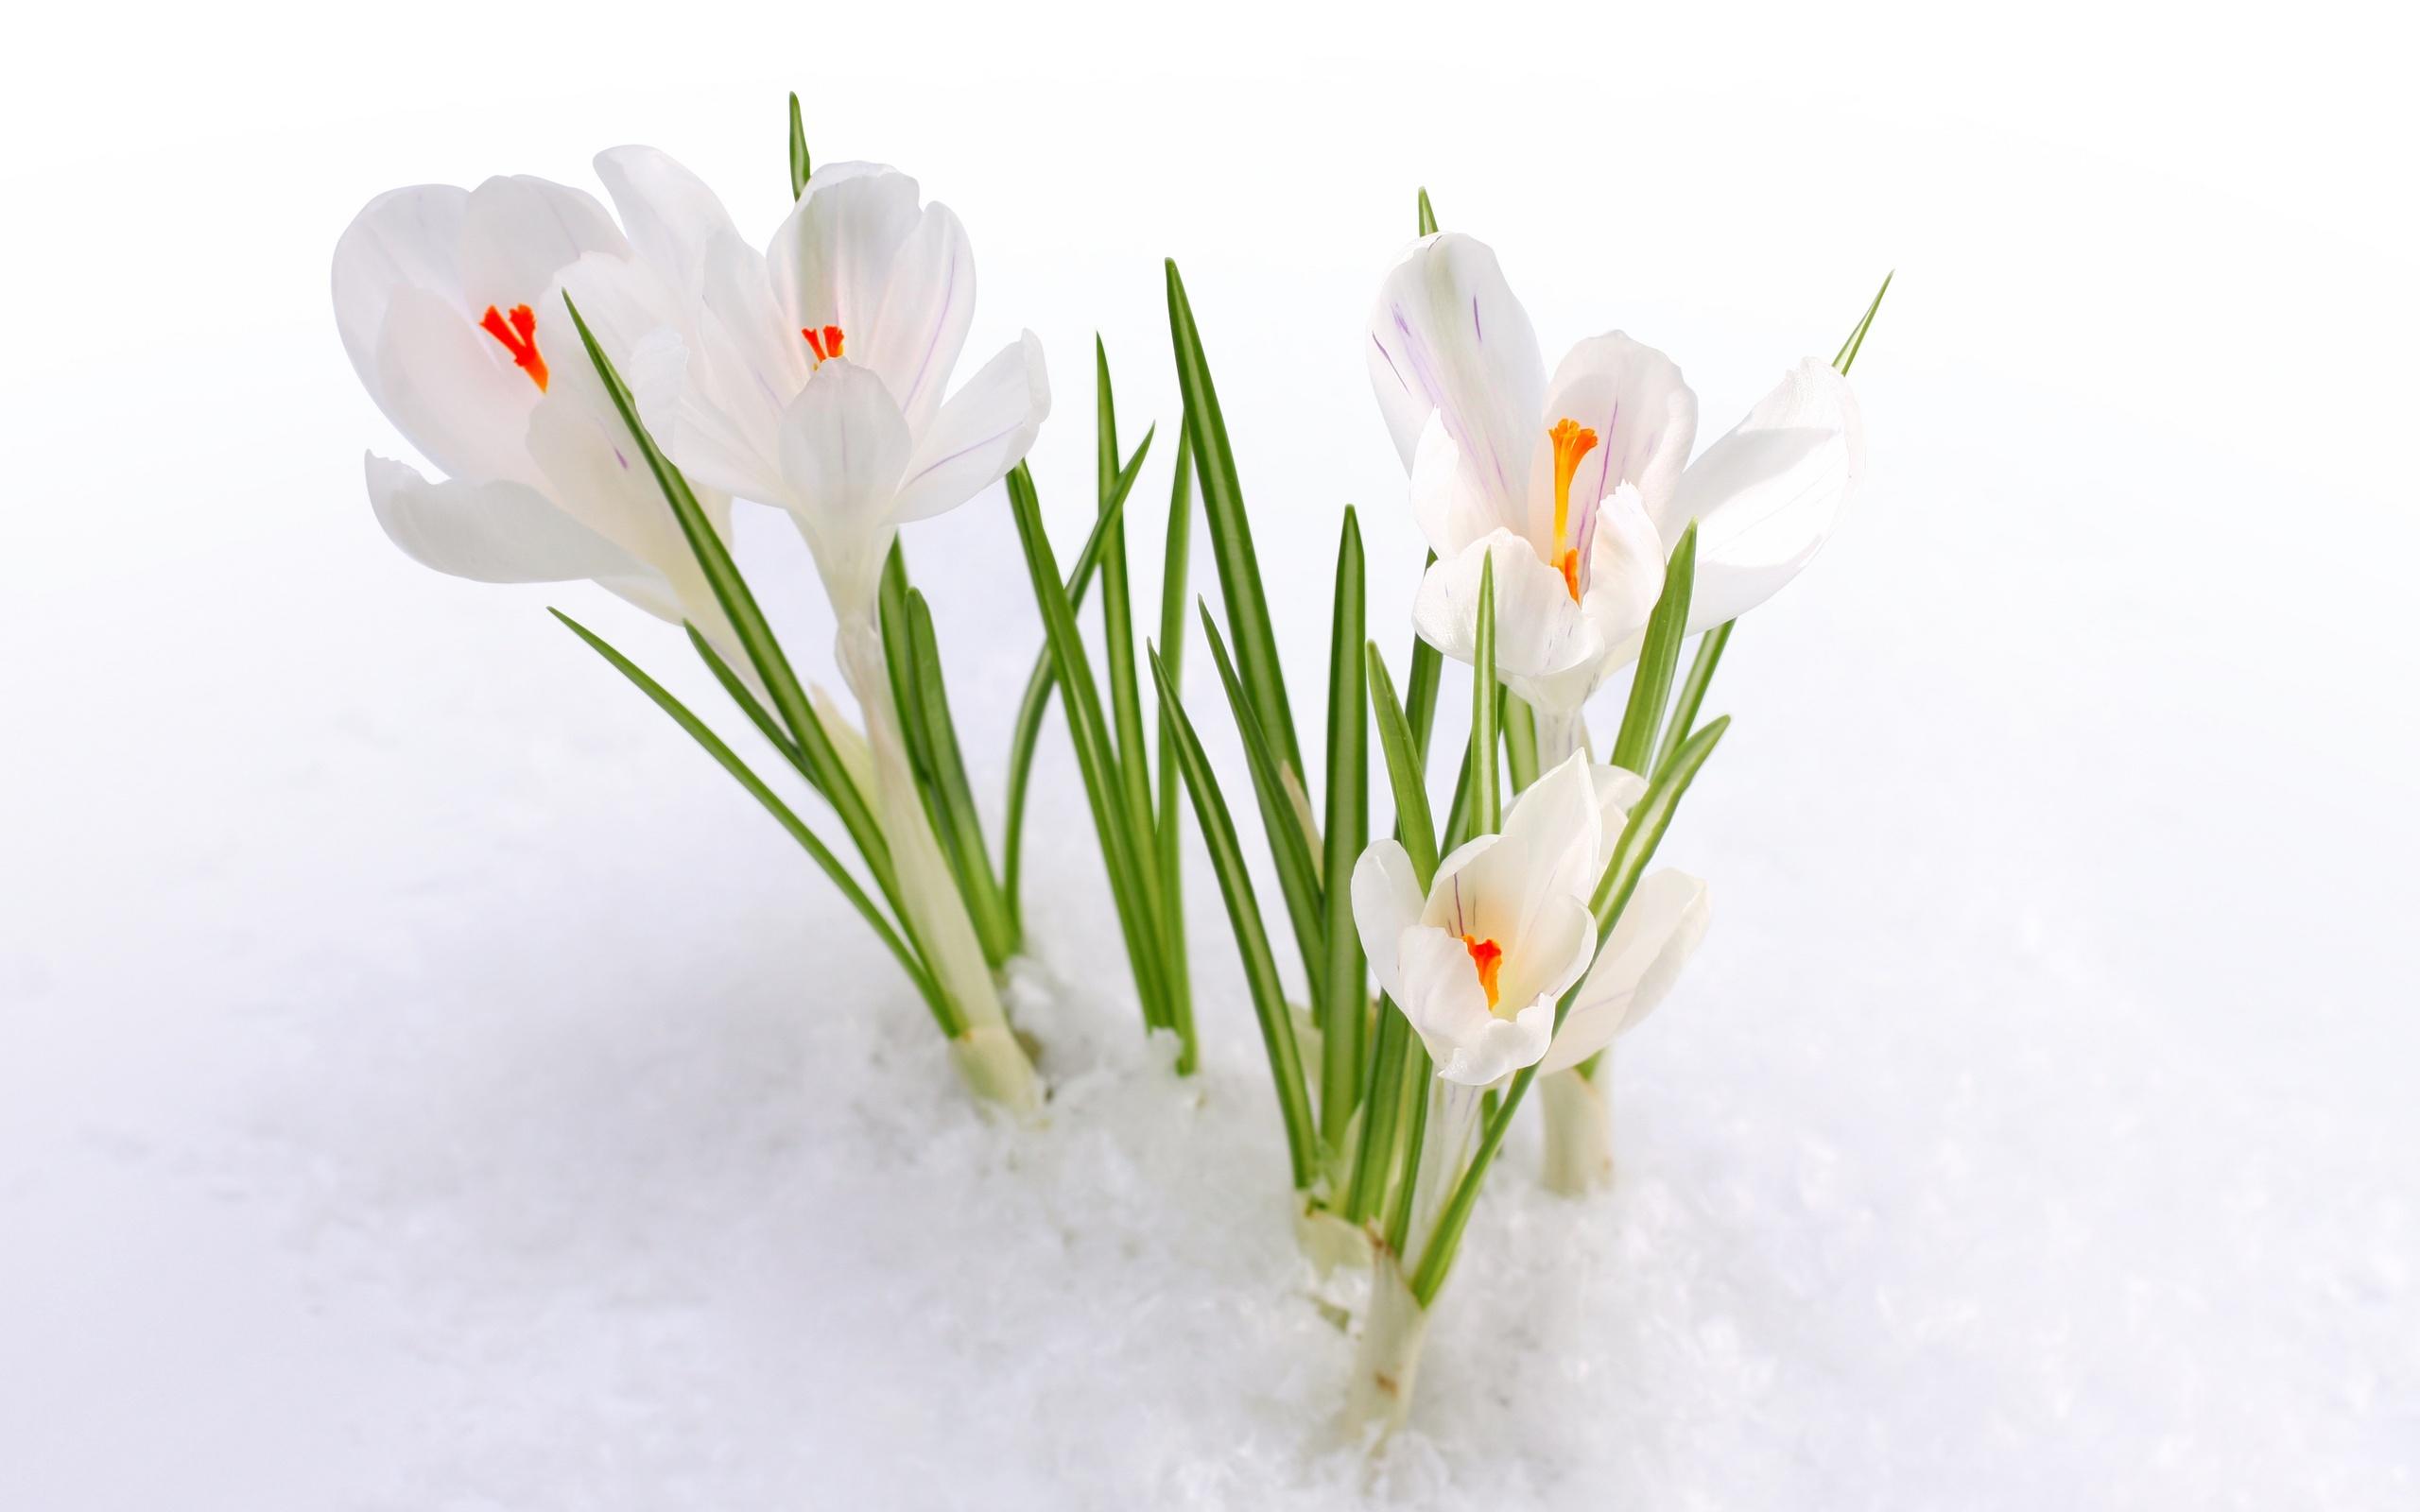 snow wallpaper white crocus